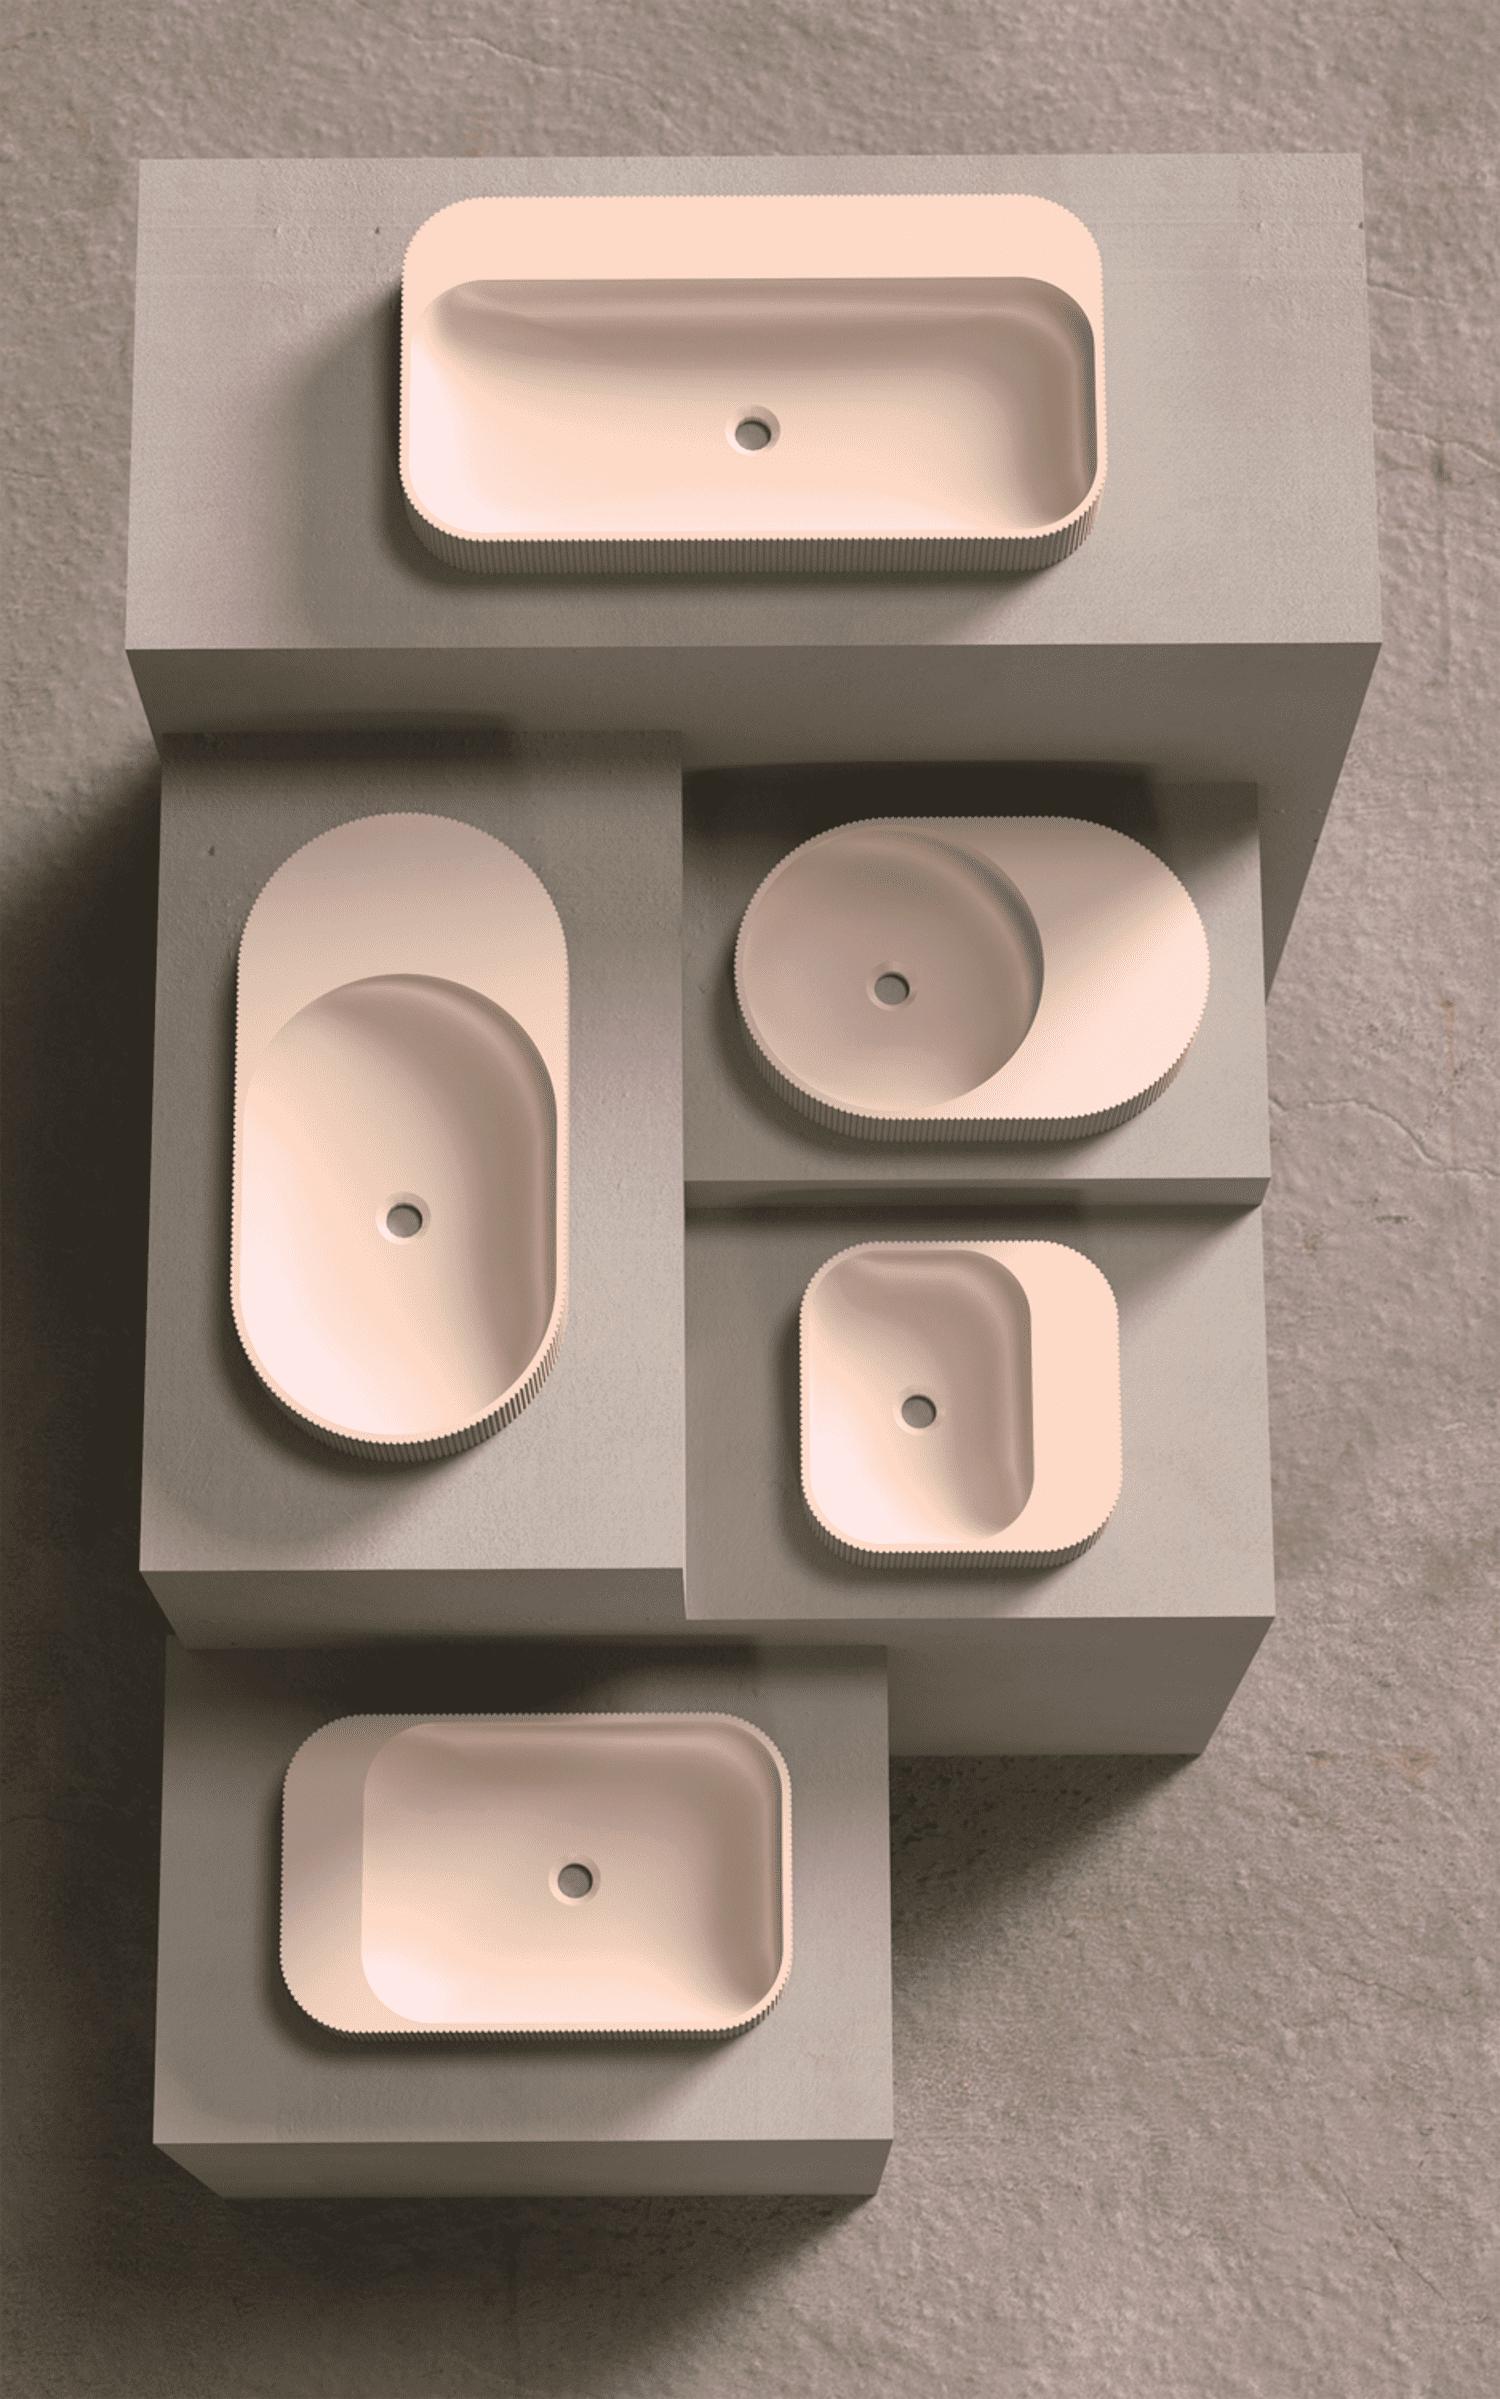 Simbiosis collection by Carlos del Castillo for Sandhelden.